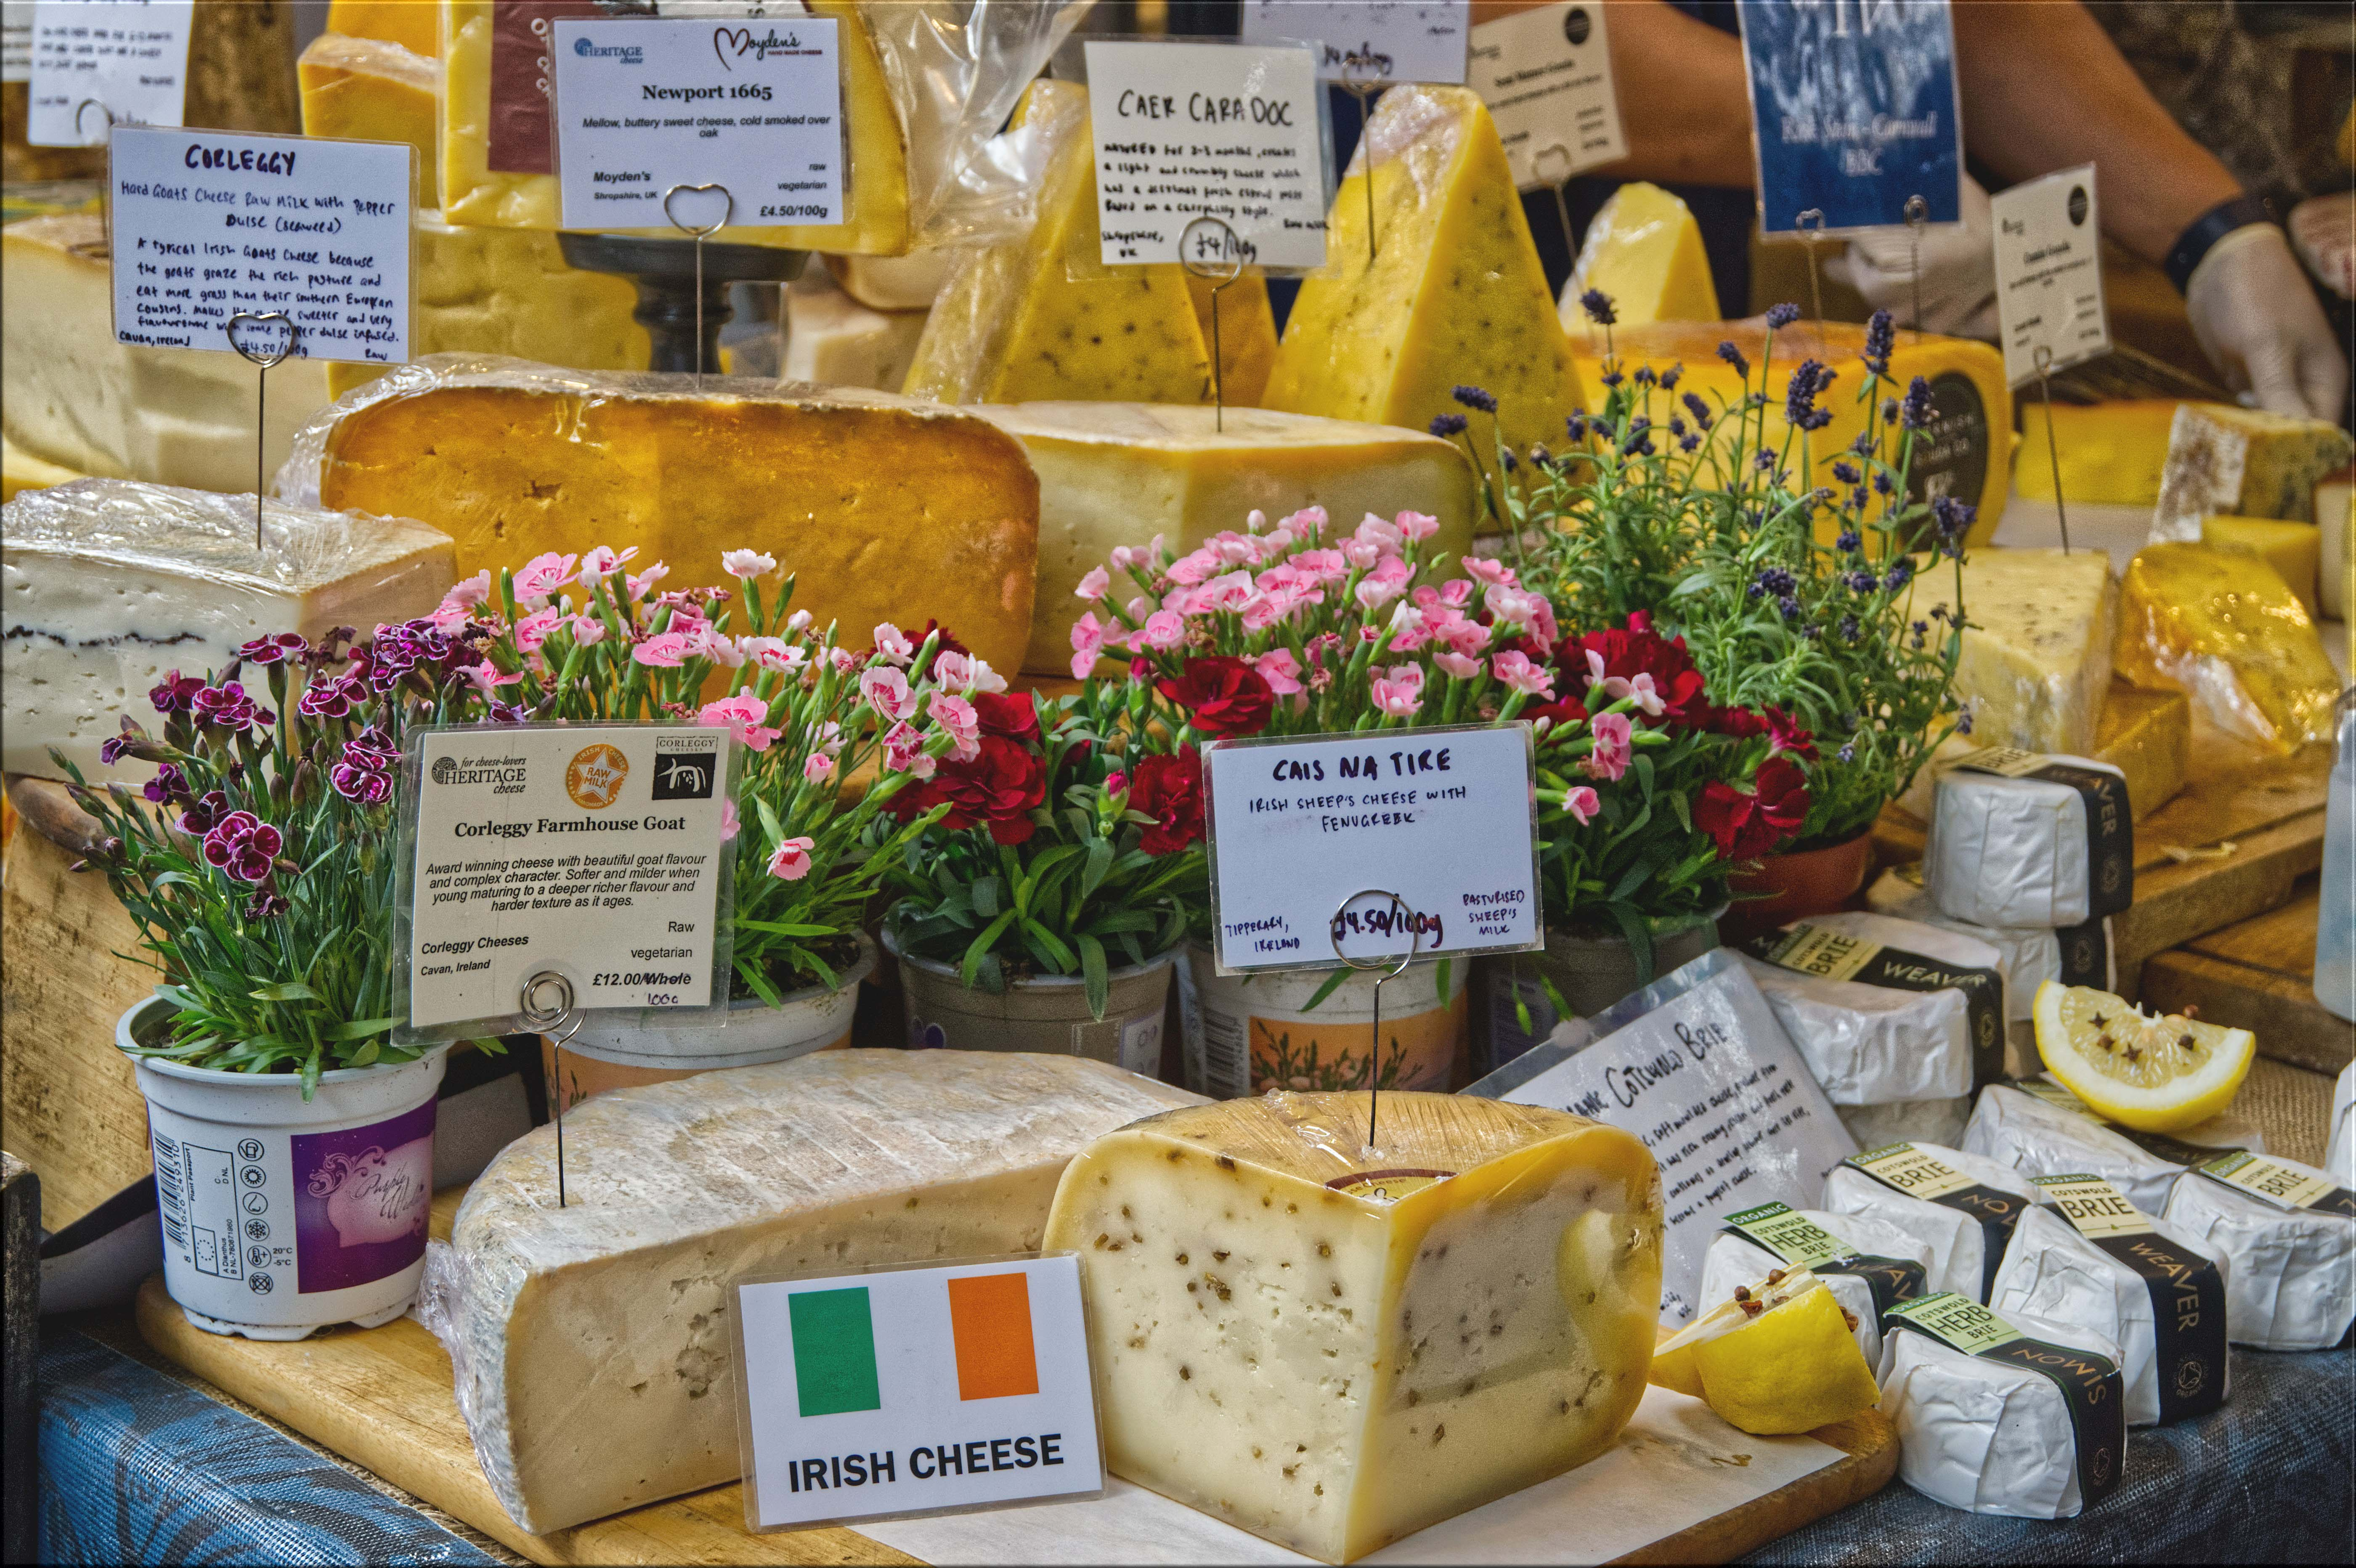 GetSetUp Photo Challenge: Week of July 23 - Wine/Cheese Photography